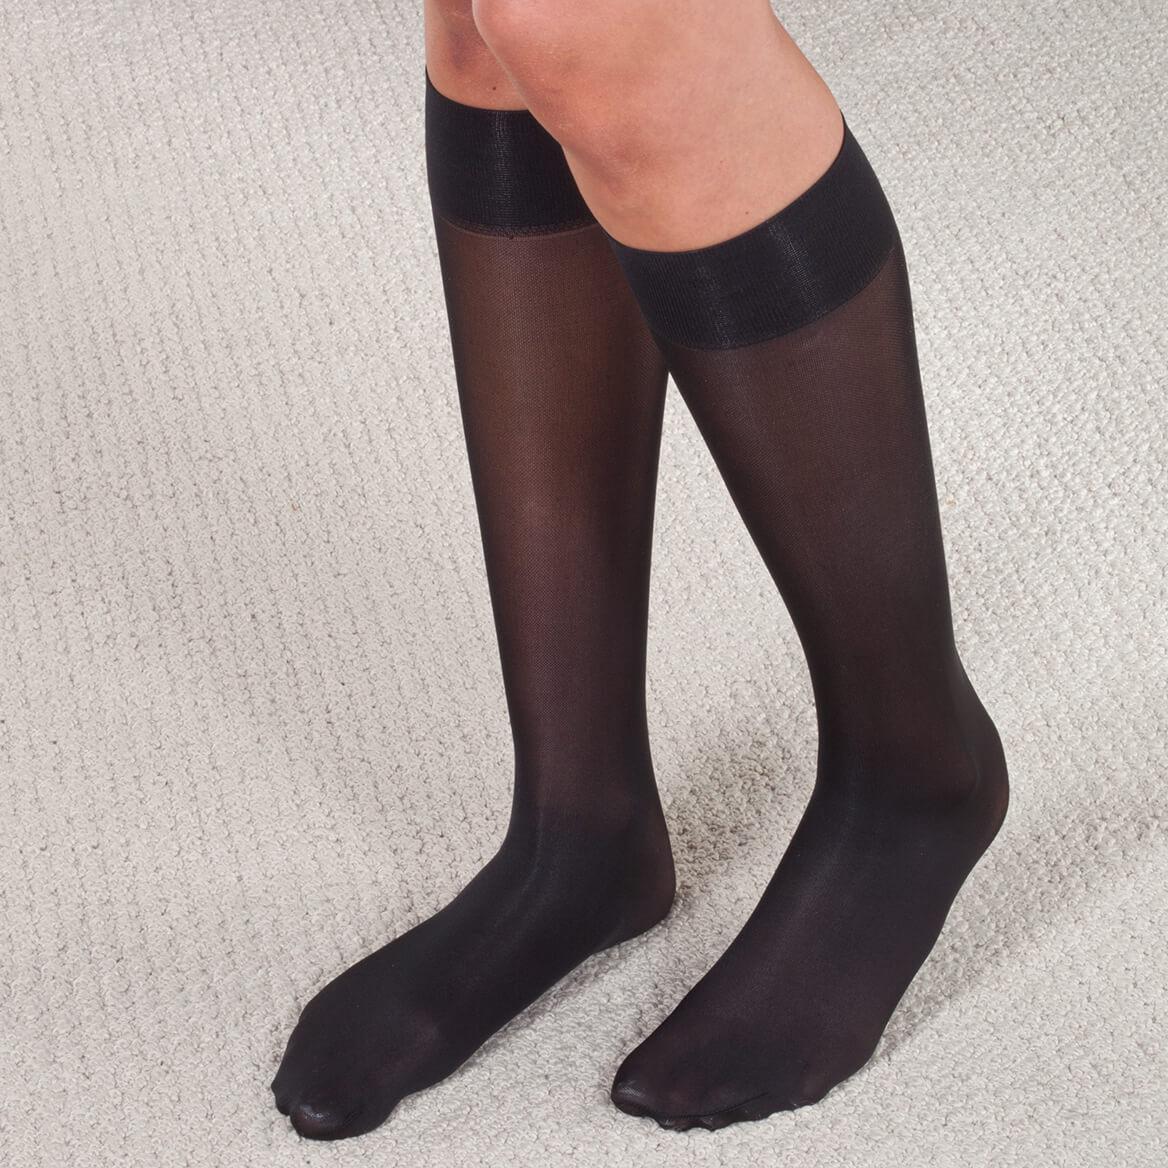 Celeste Stein Compression Socks 8-15mmHg-352877